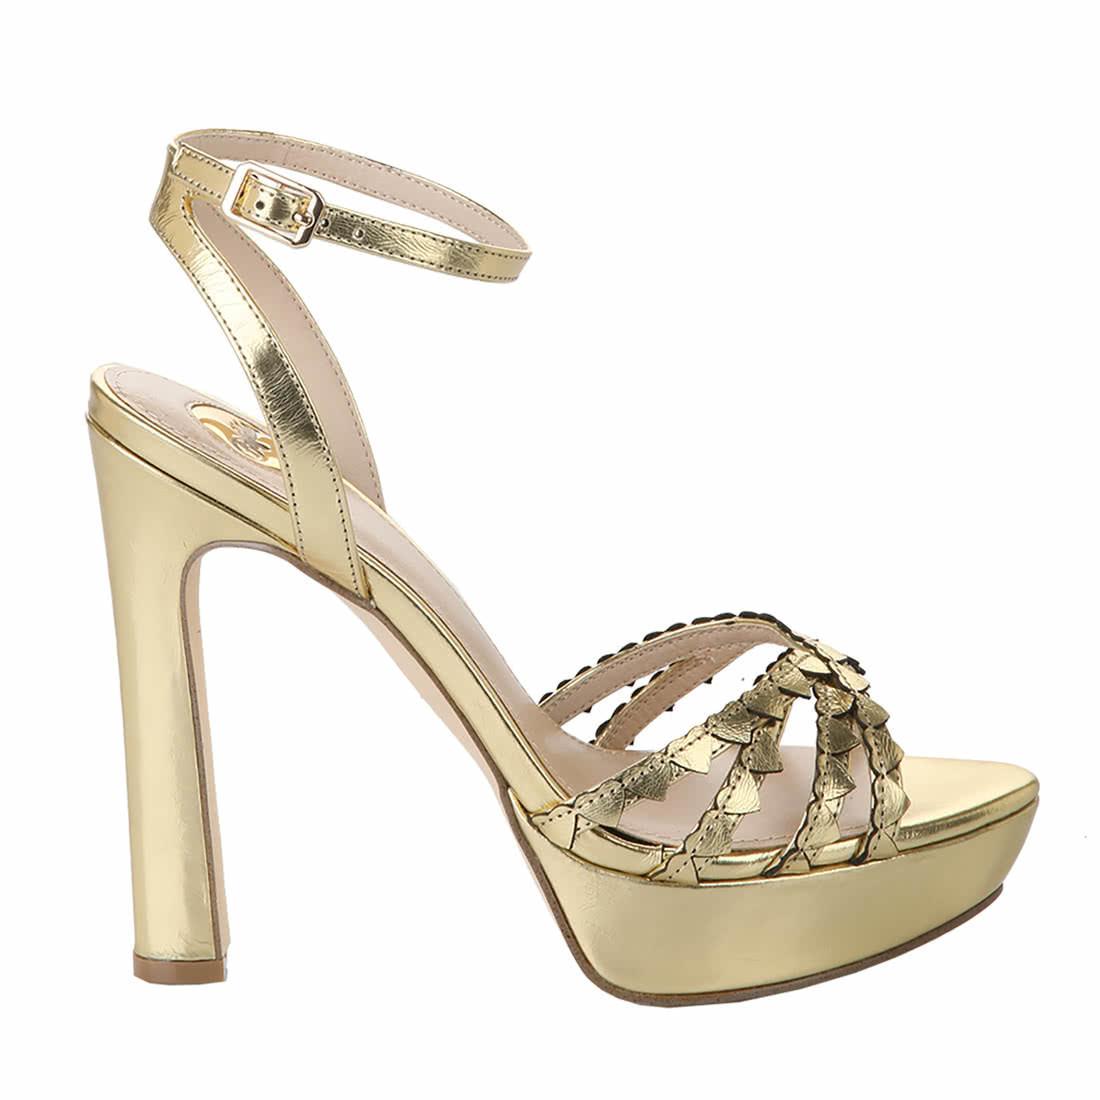 Marzipan Aus Metallic Leder Sandalette Kaufen Gold Online SjLq3c4R5A